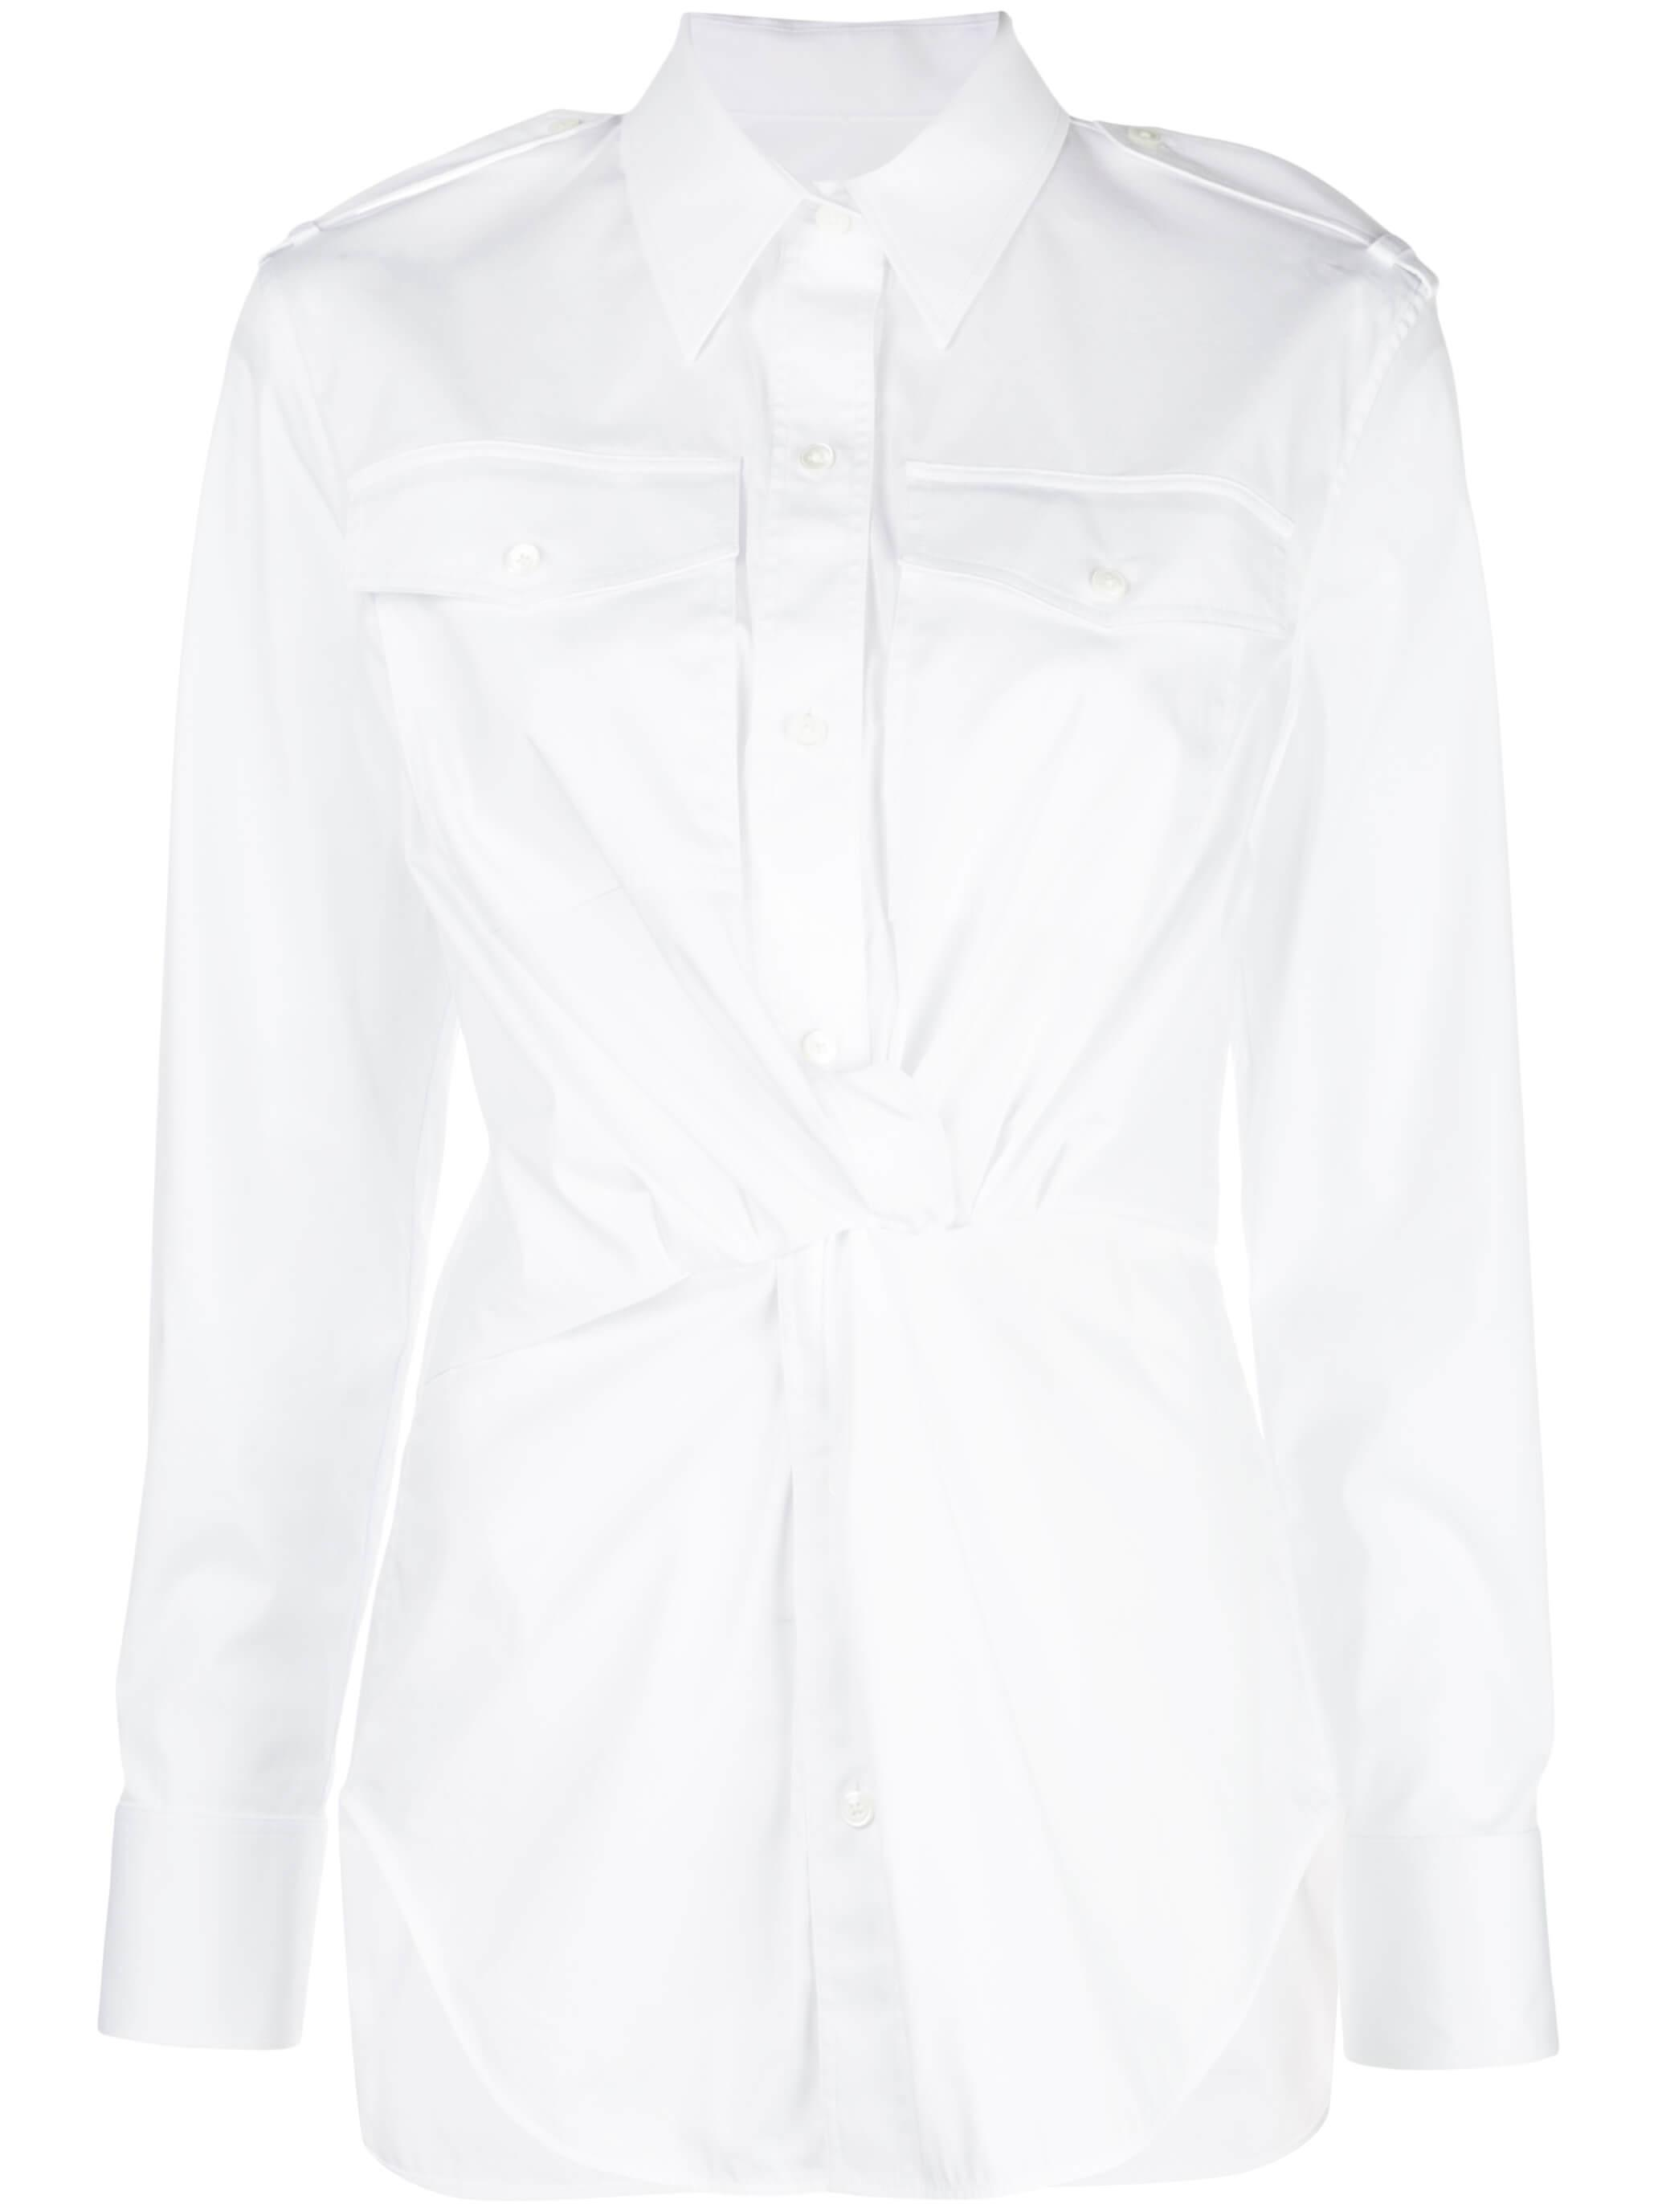 Compact Cotton Poplin Knot Shirt Item # K01HW505